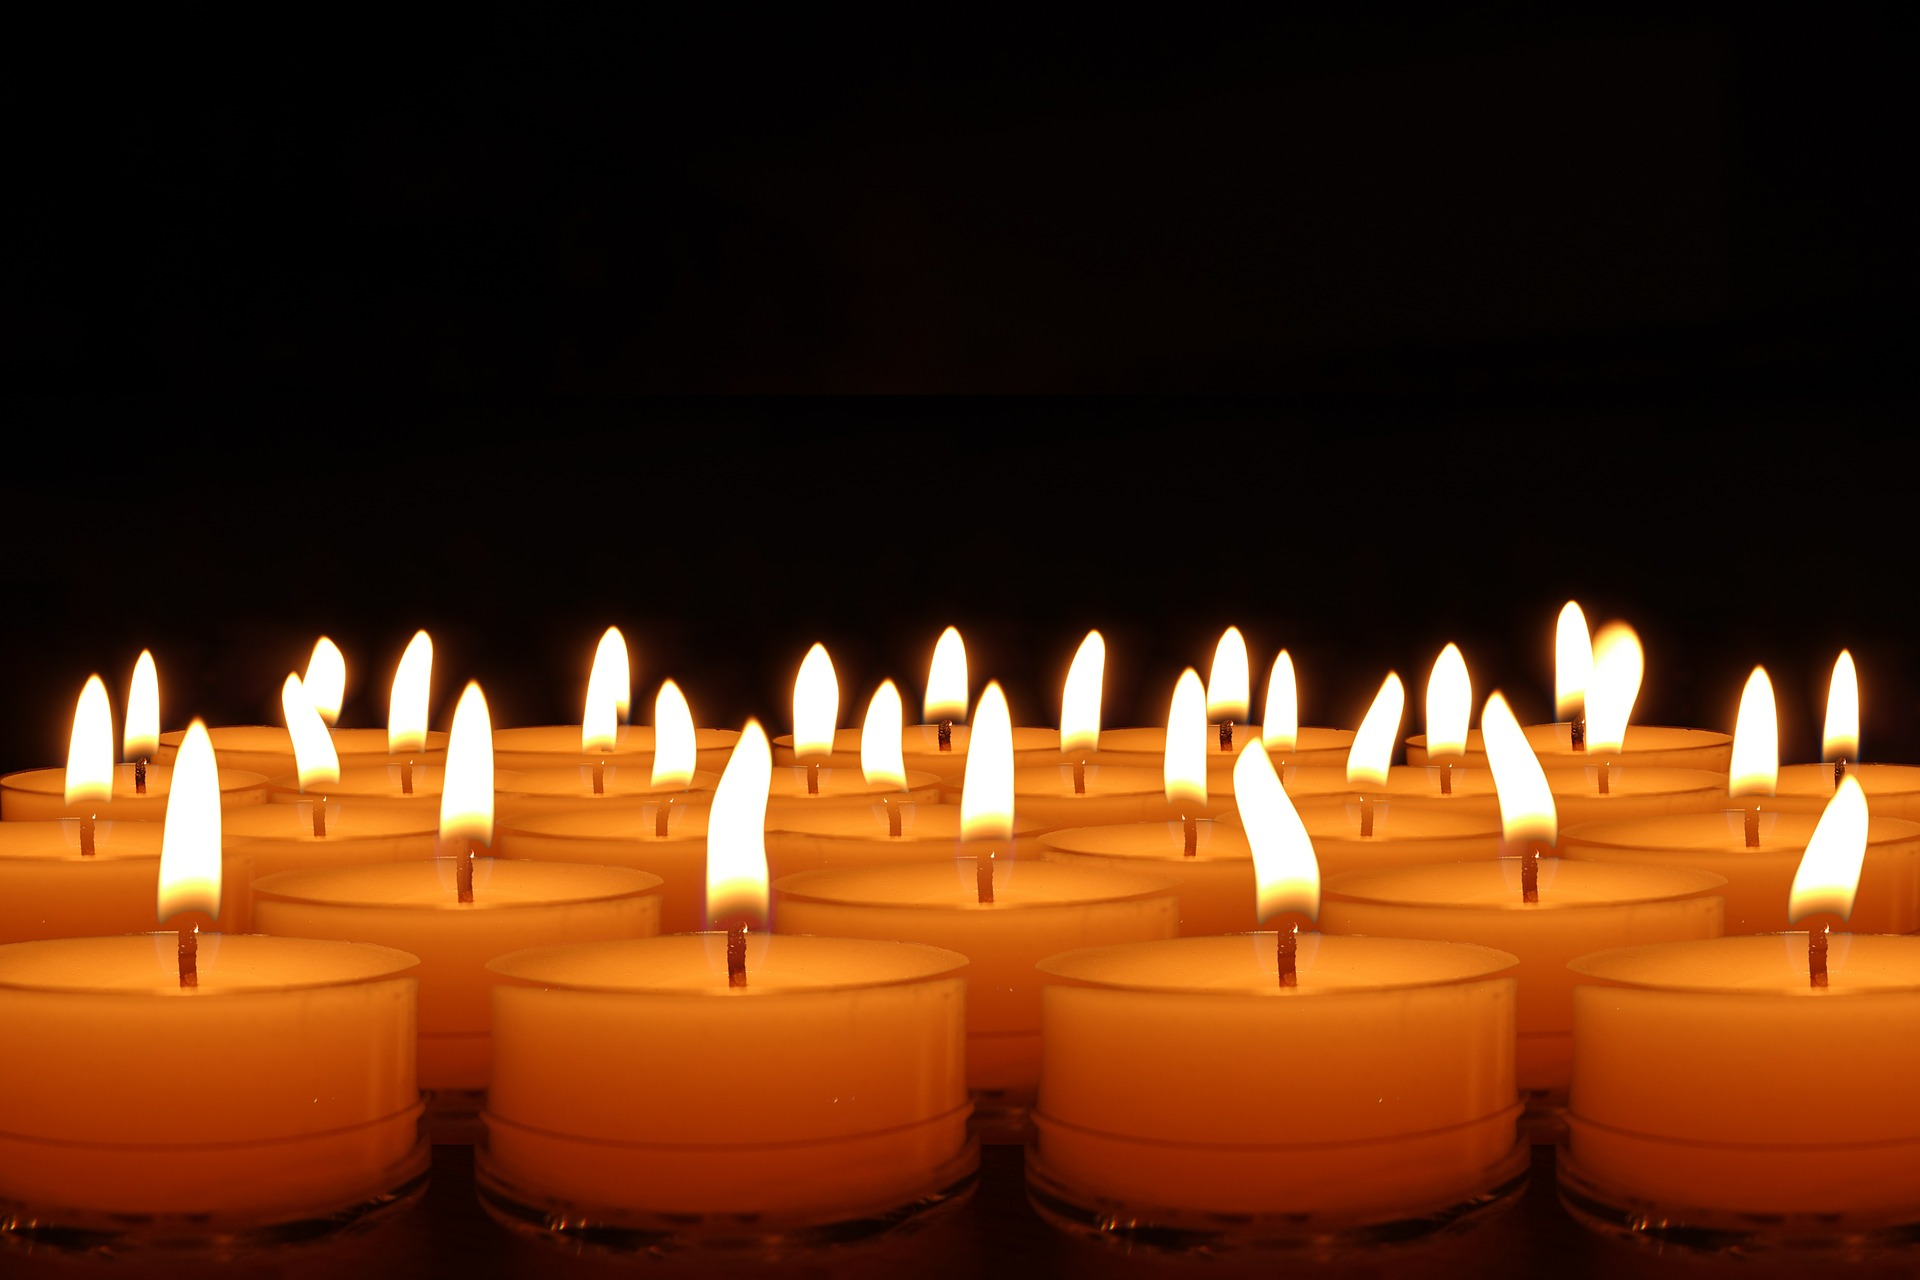 candles-492171_1920.jpg